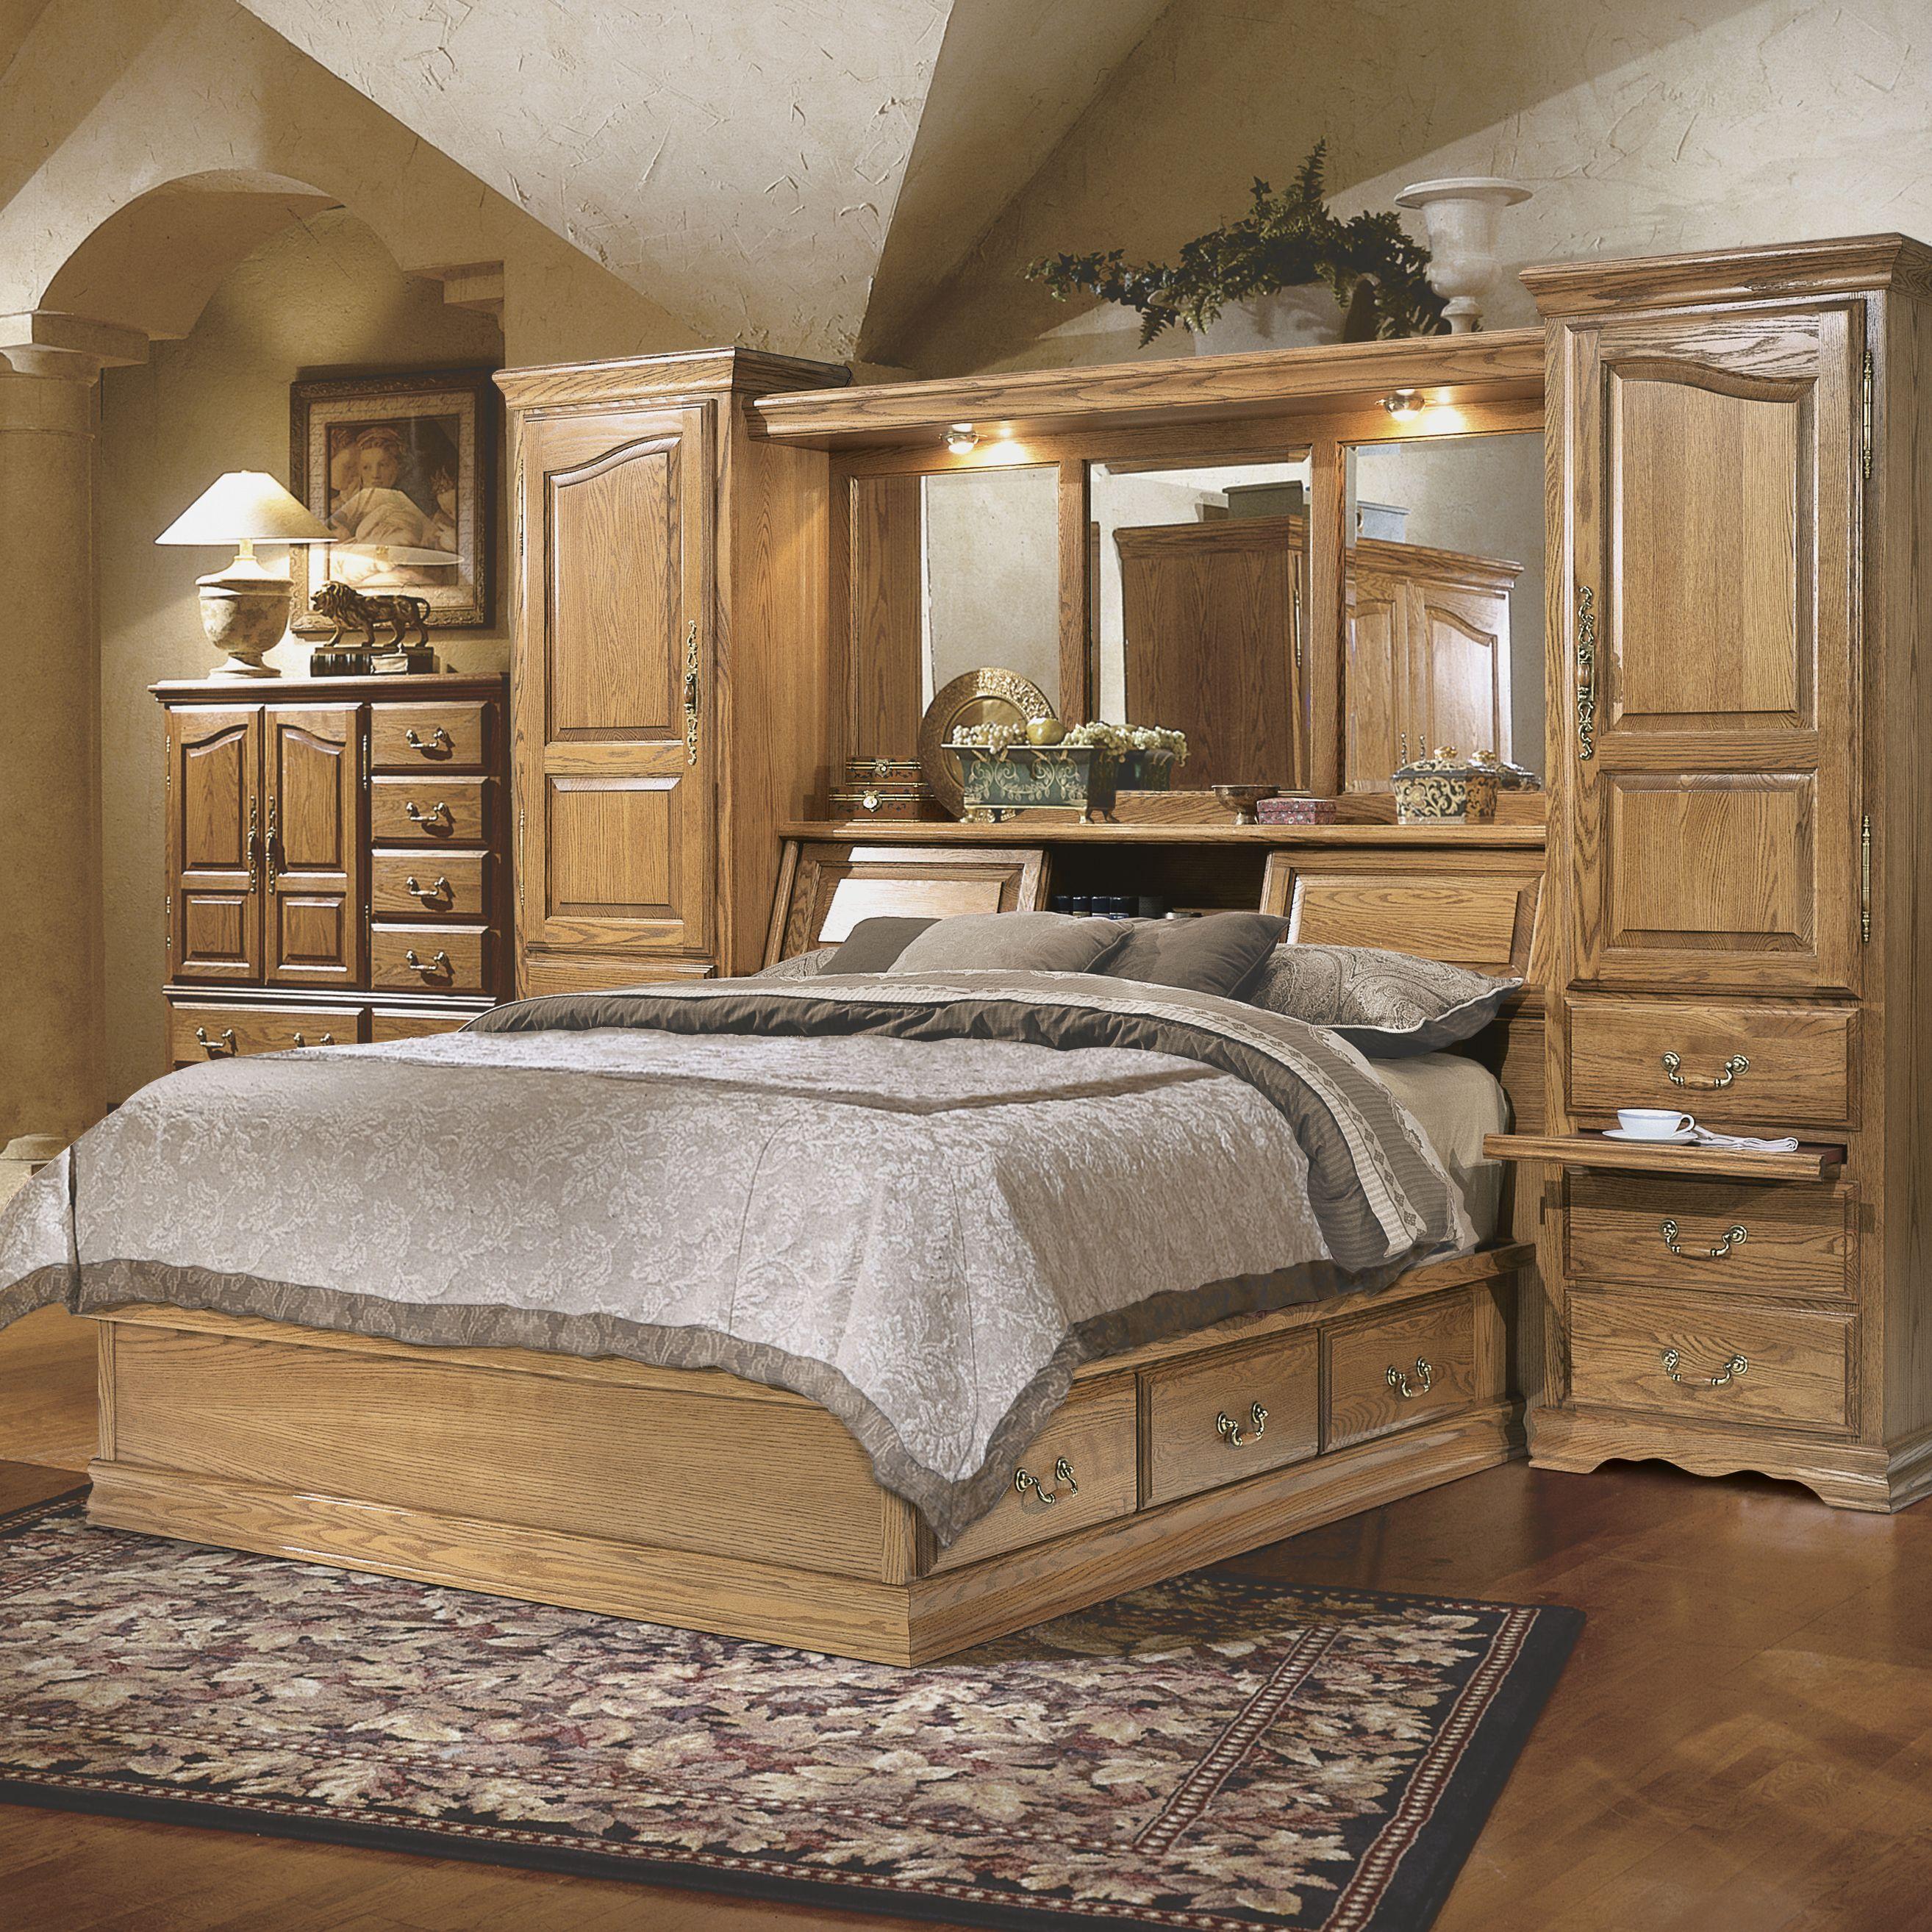 Masterpiece Pier Group bedroom set provides maximum